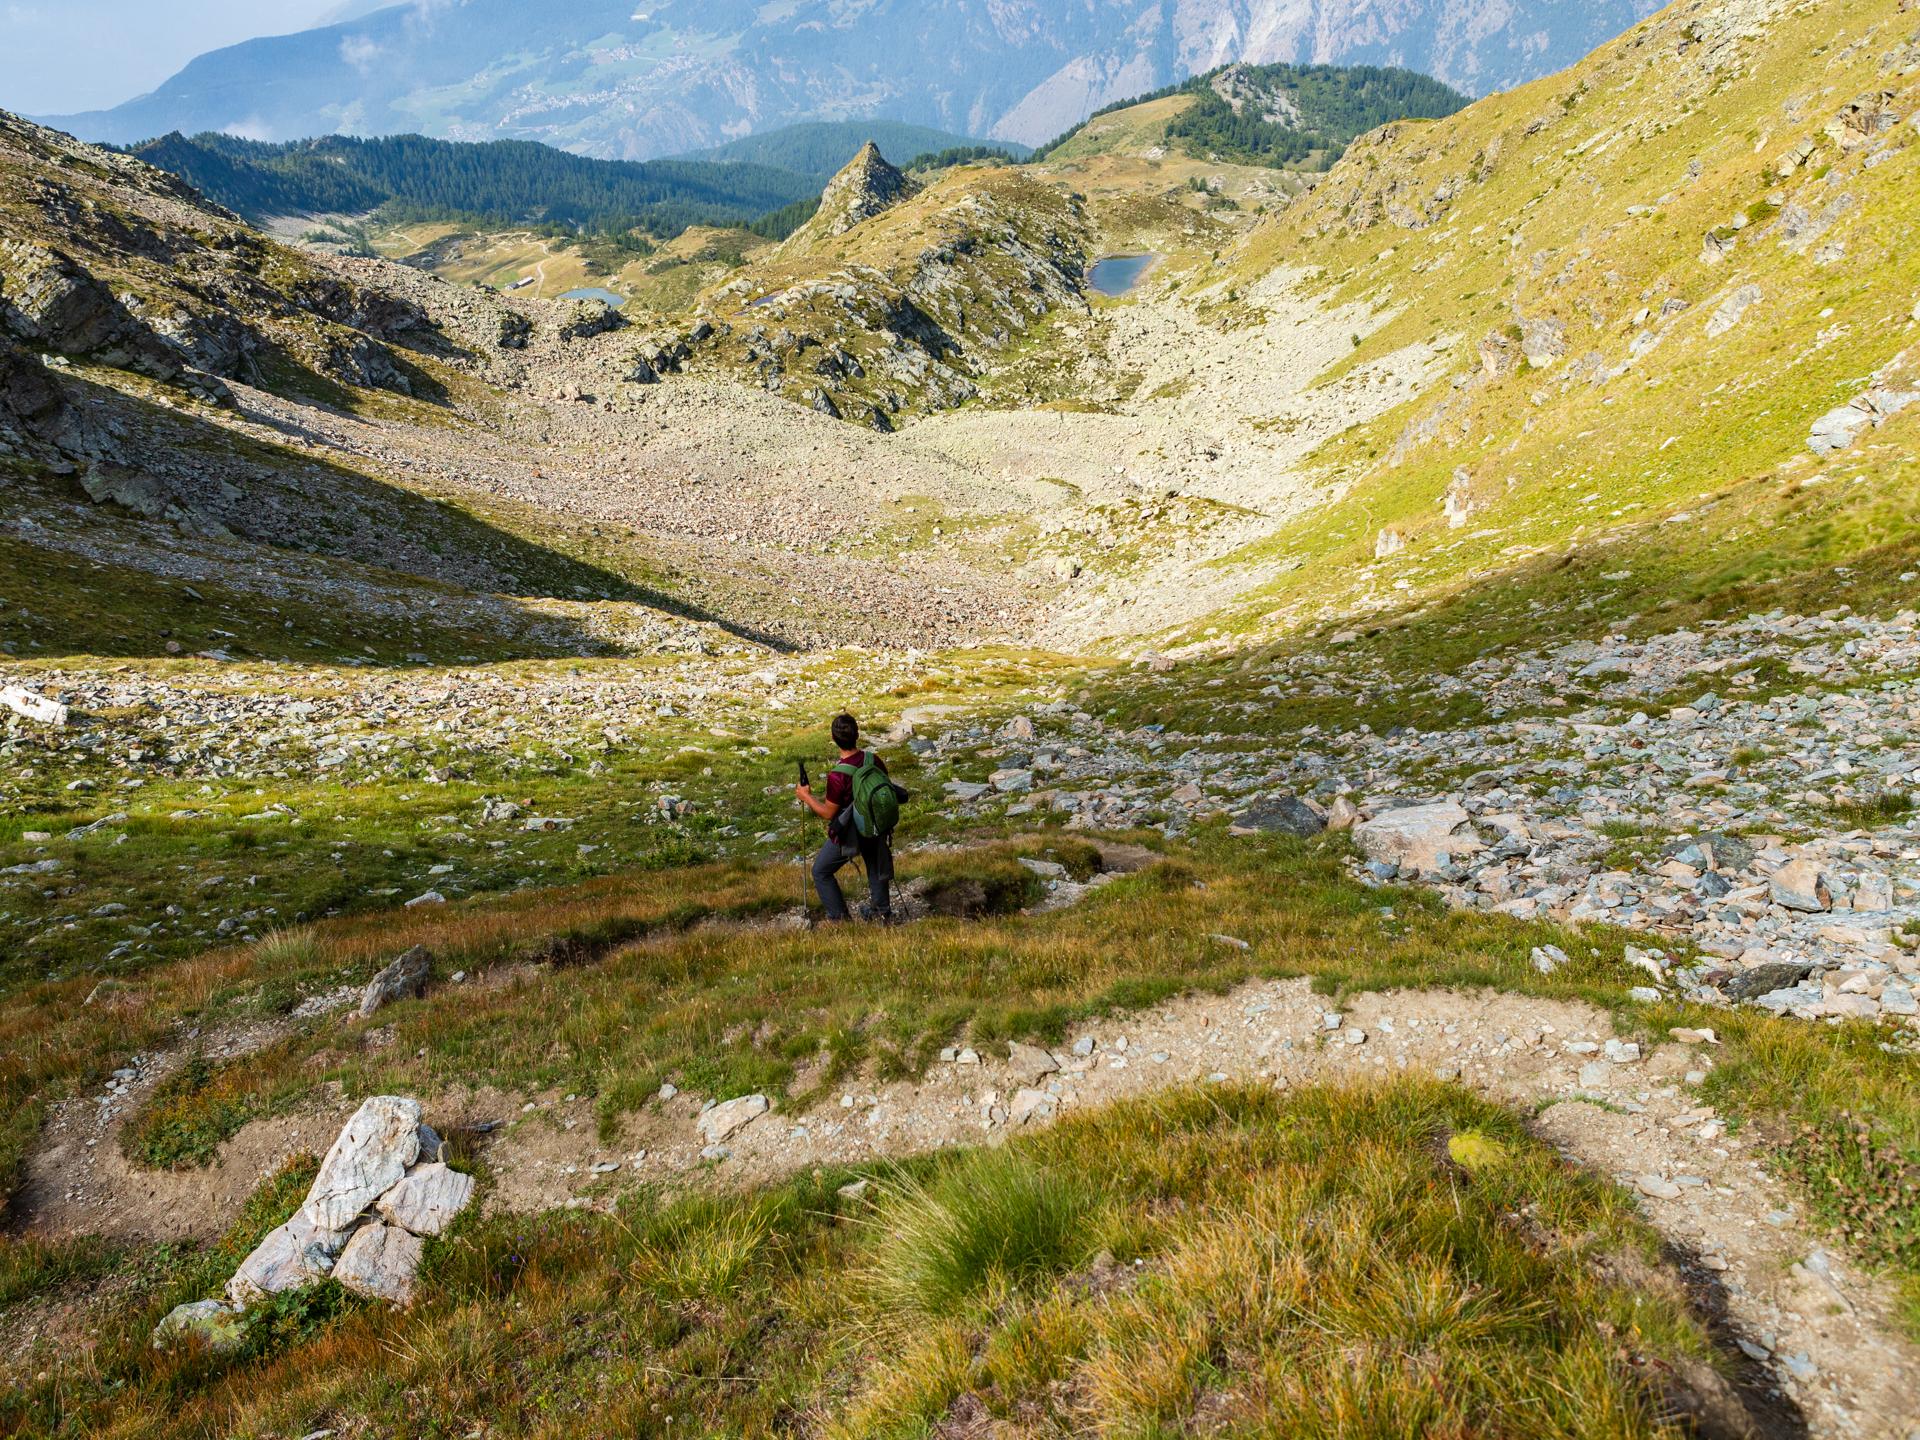 Piscina interna r t a au coeur des neiges valle d 39 aosta - Hotel corvara con piscina interna ...